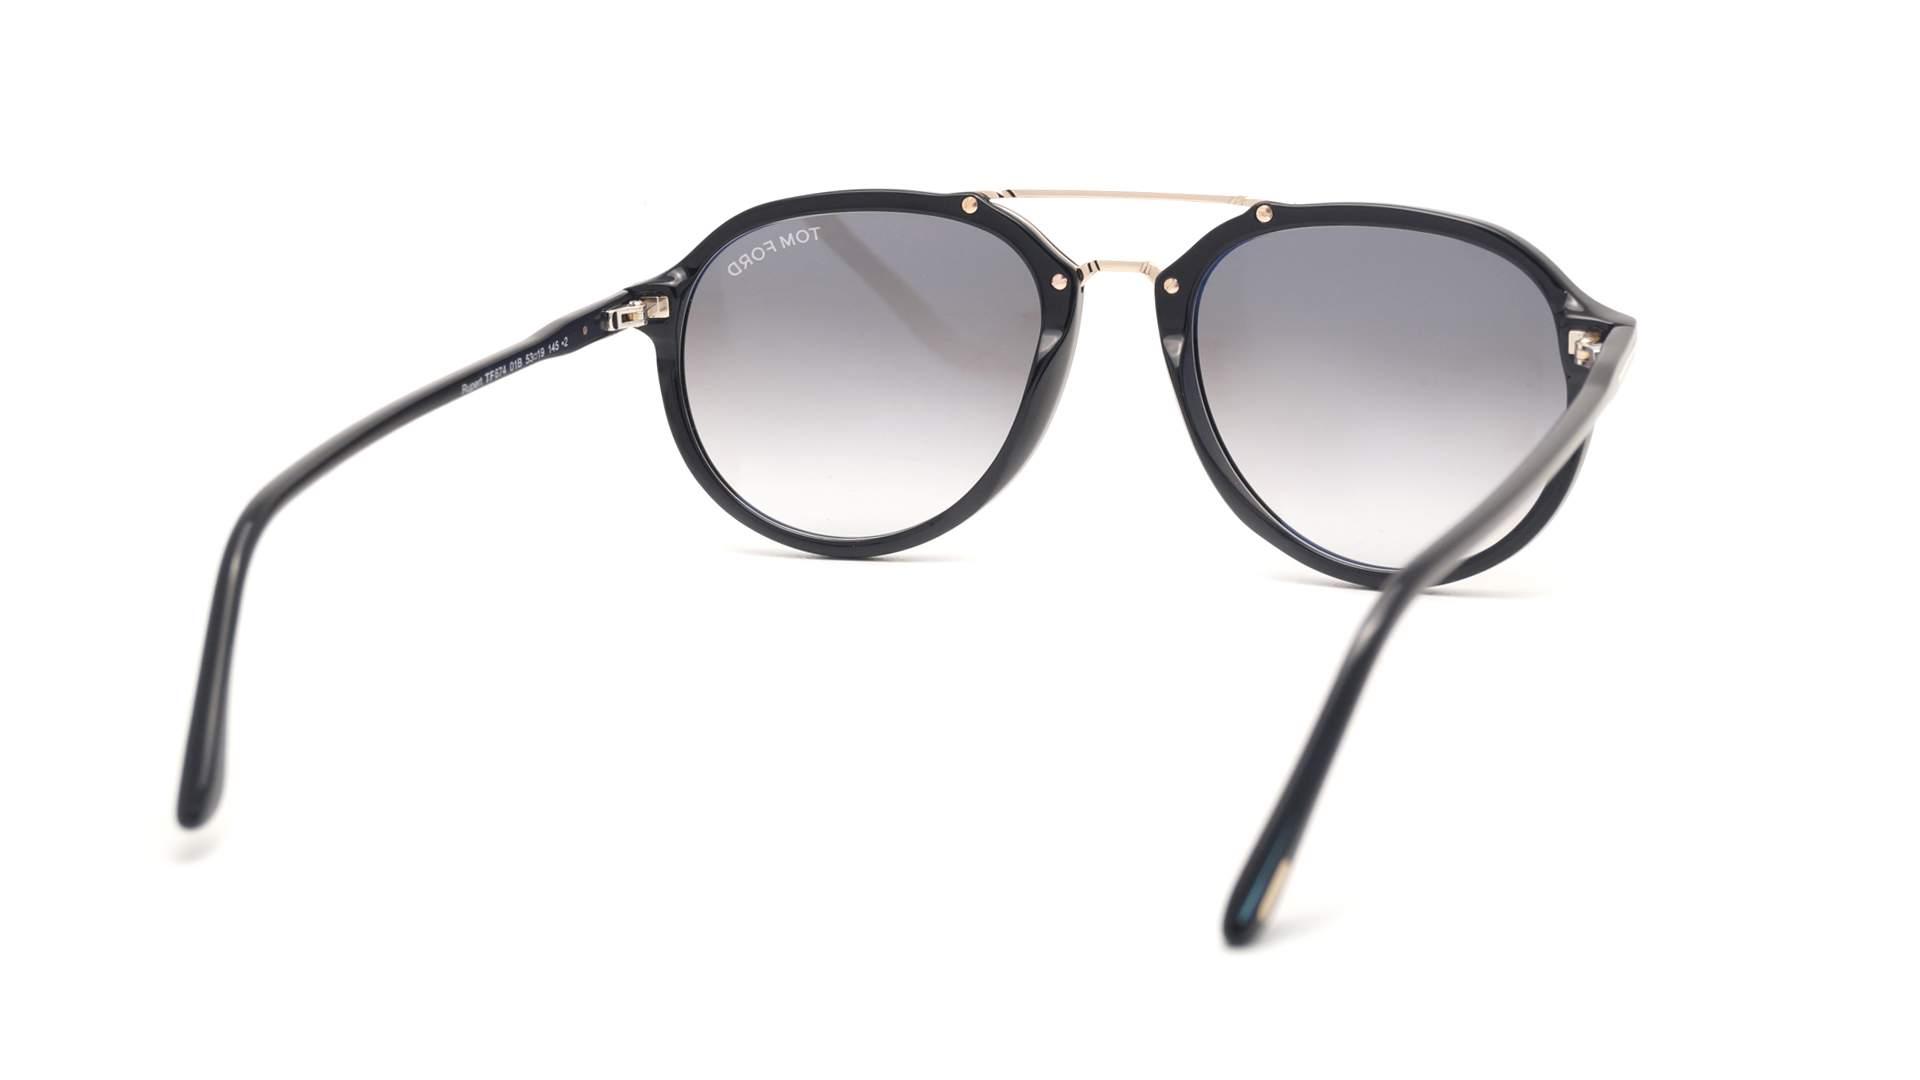 e1cedbaed68 Sunglasses Tom Ford FT0674S 01B 55-19 Black Large Gradient